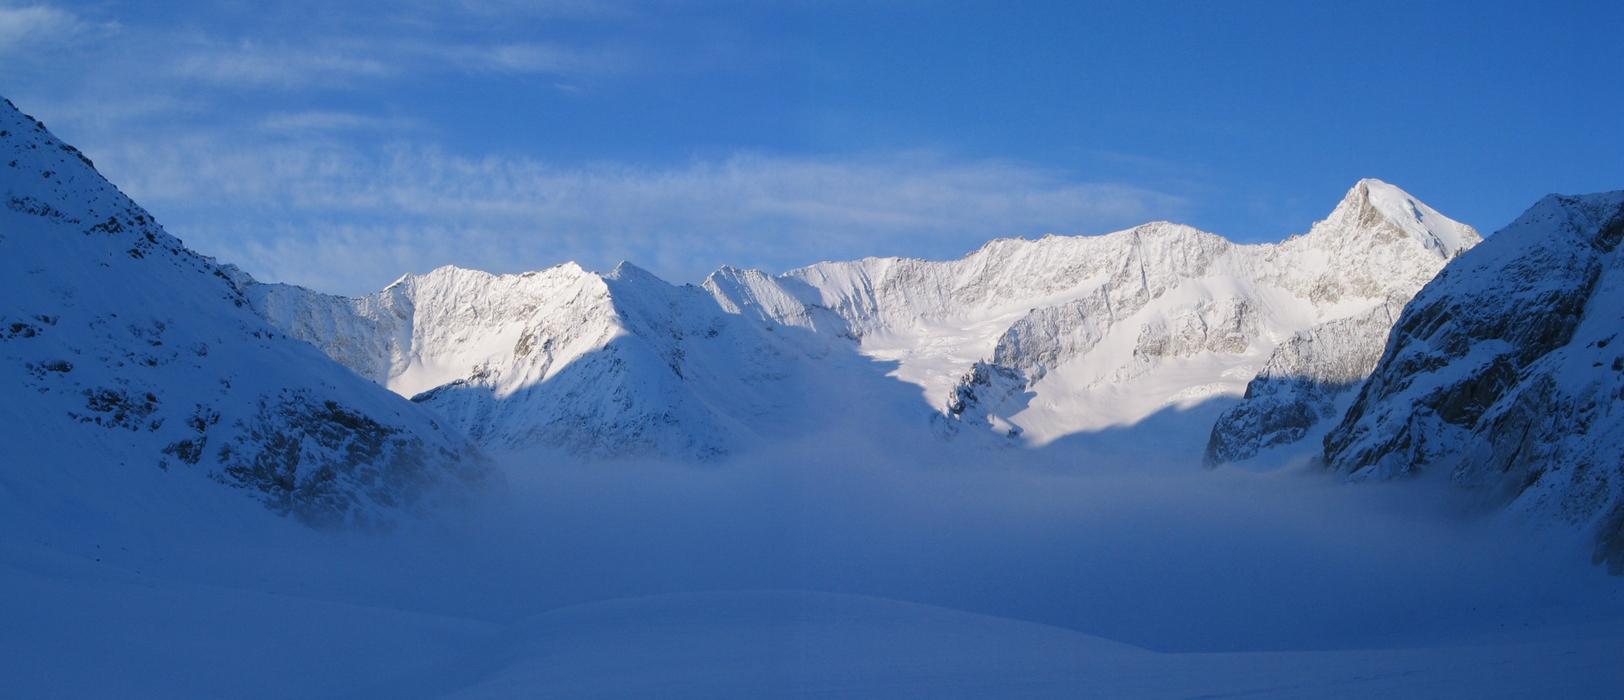 Grosser Aletschhorn Berner Alpen / Alpes bernoises Switzerland panorama 06